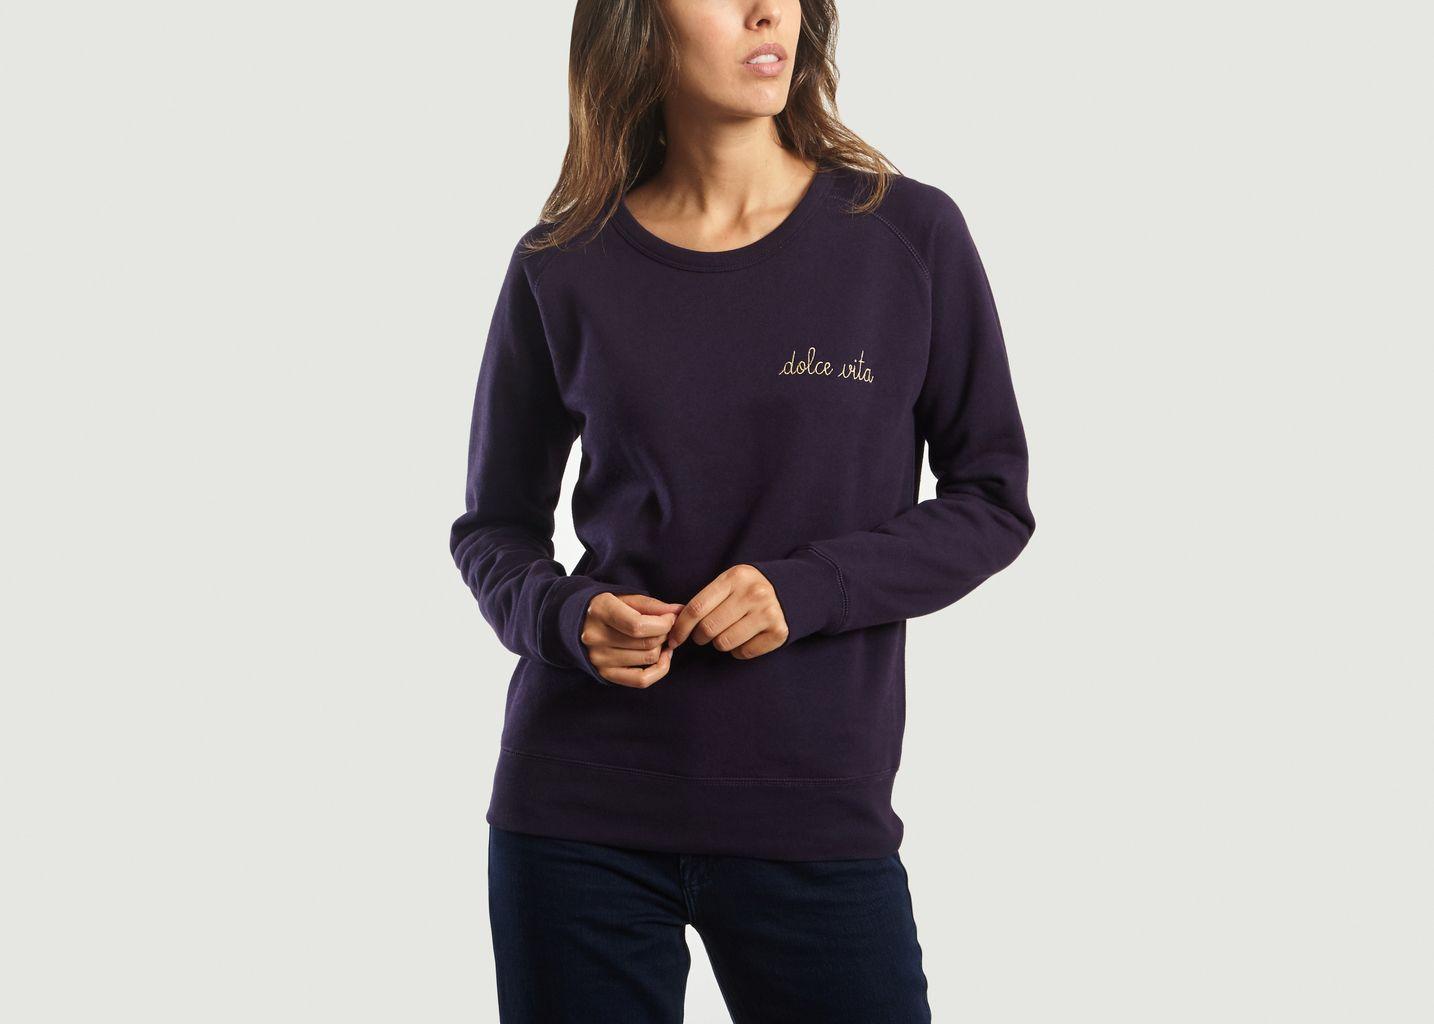 Sweatshirt Dolce Vita - Maison Labiche